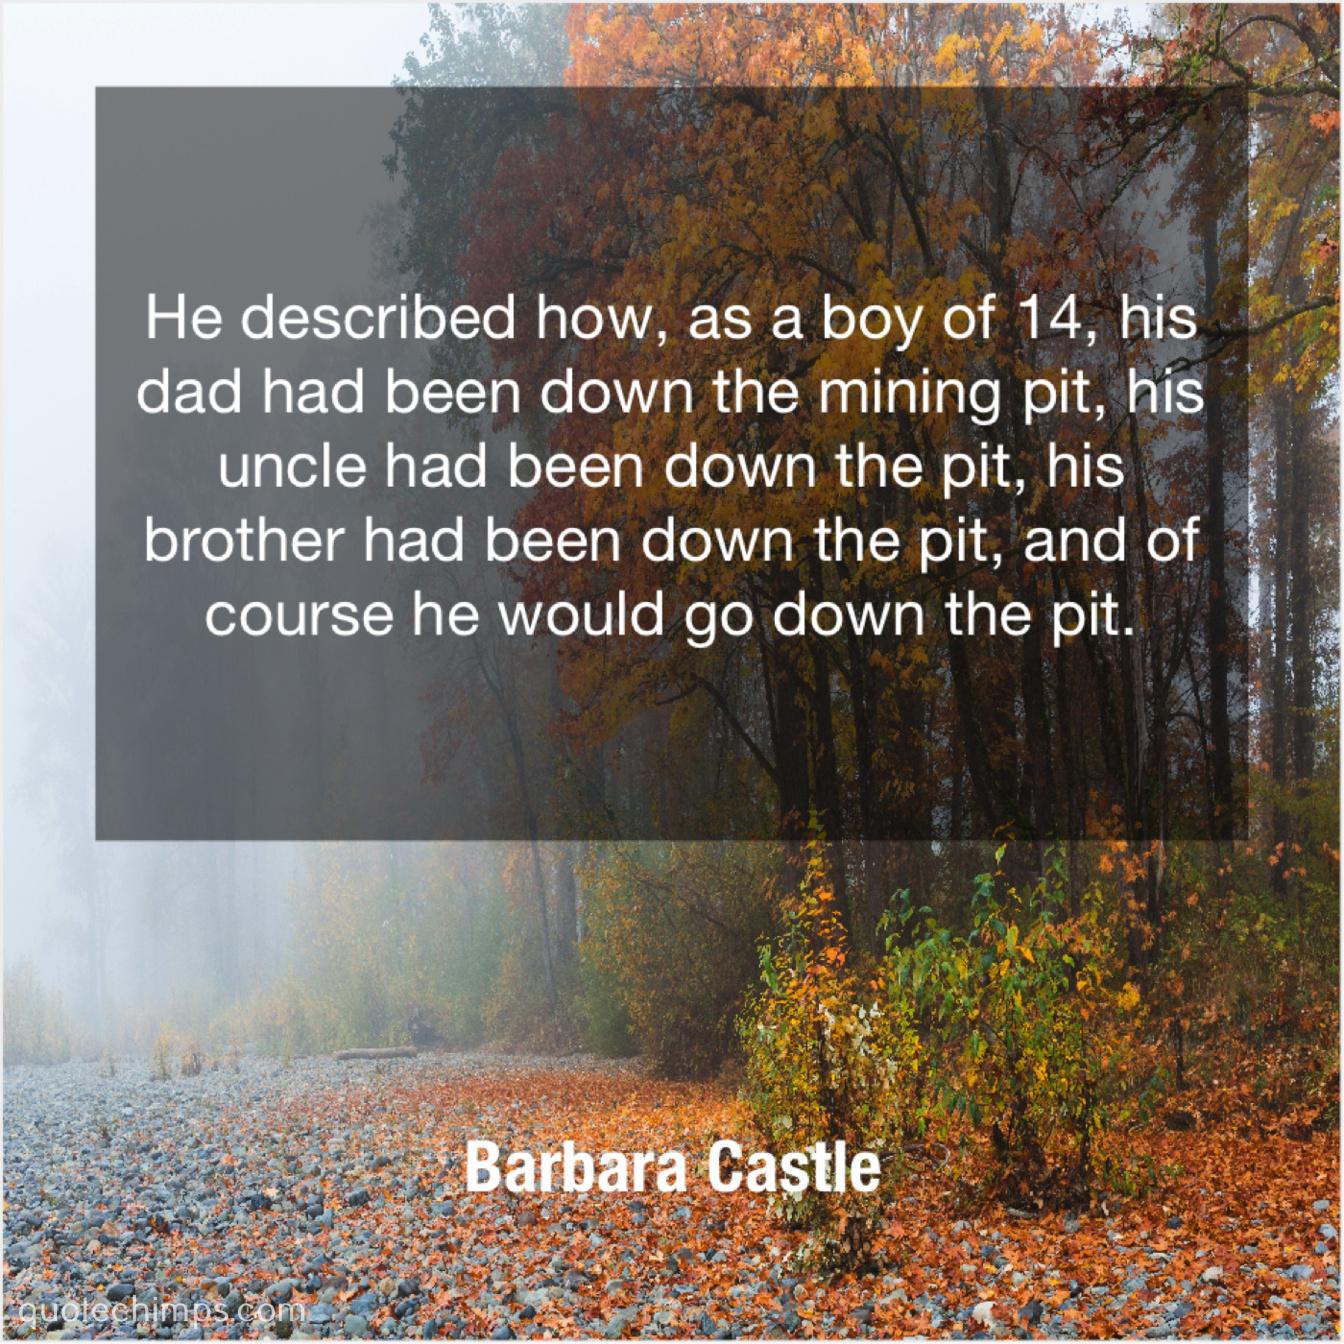 barbara castle quote chimps